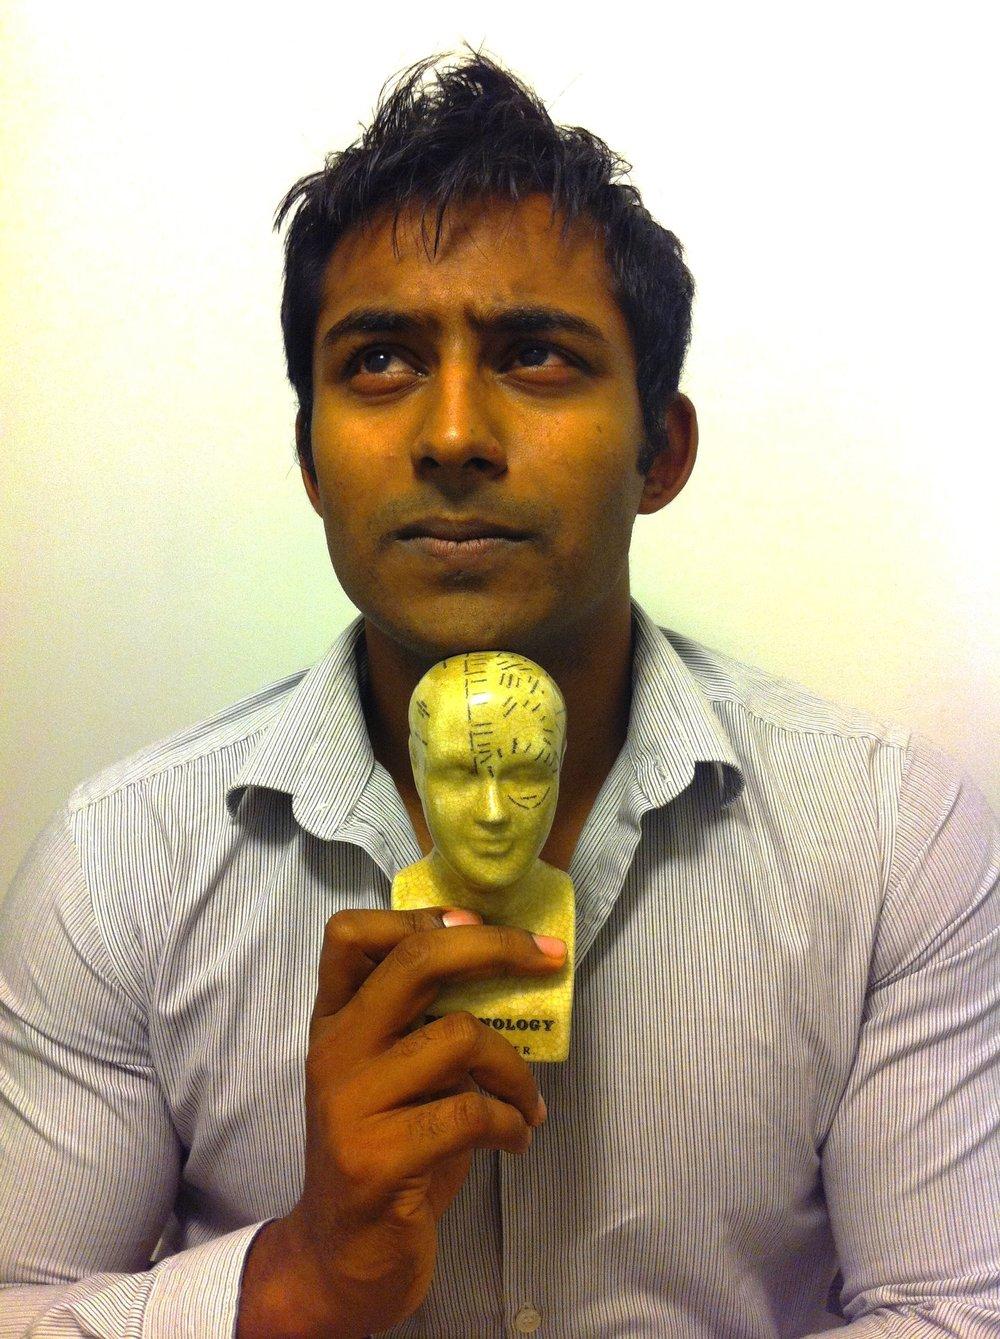 02nd Prize Disfigured Dignity by Sohom Das (Category: Literary) -